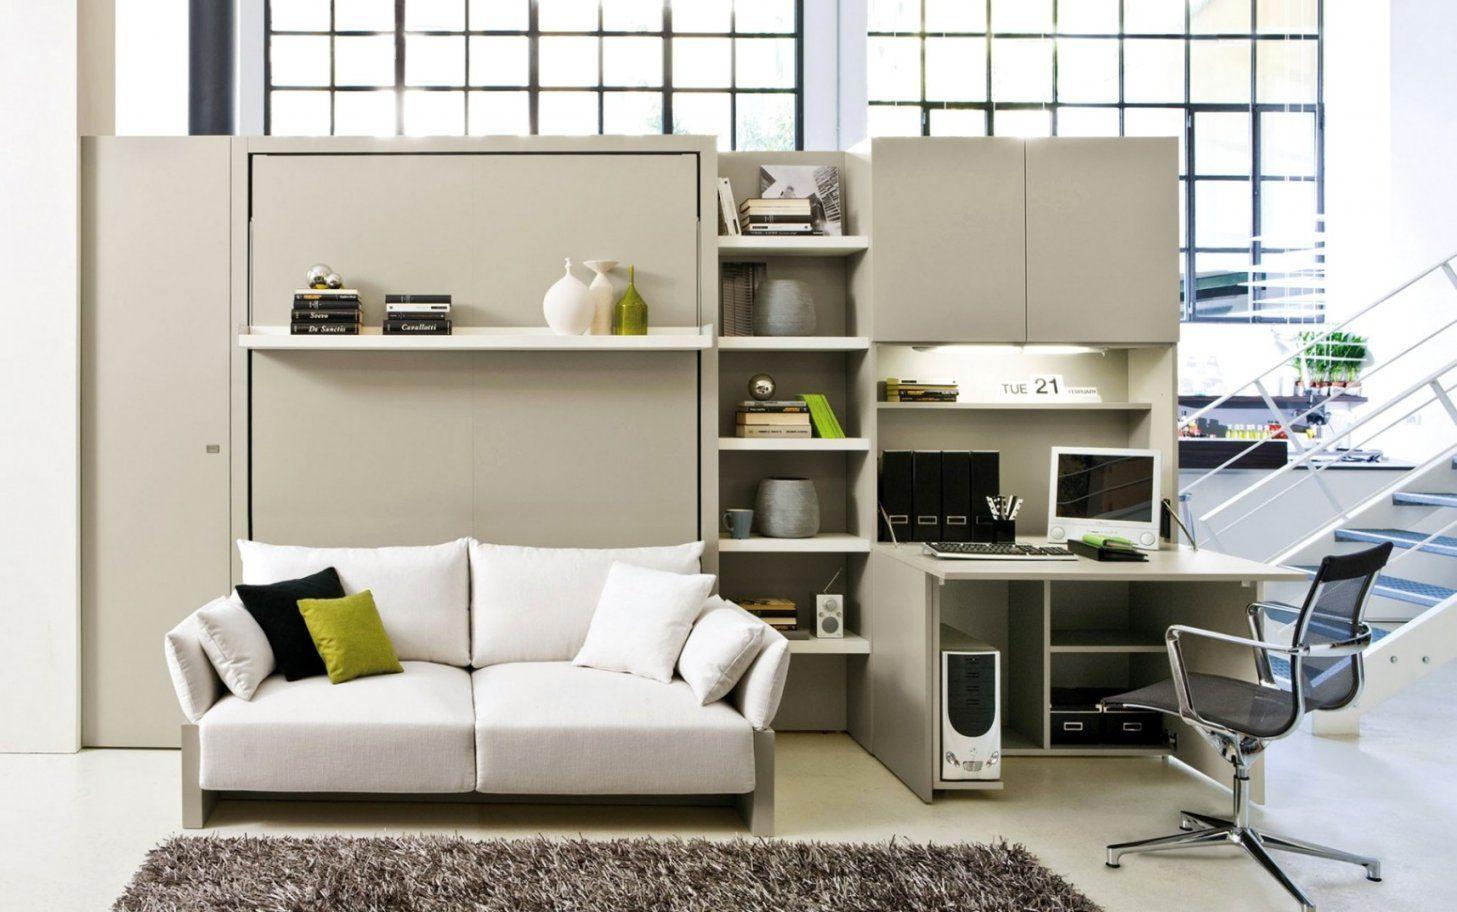 Interessant 46 Elegant Schrankbett Mit Integriertem Sofa Für von Schrankbett Mit Integriertem Sofa Photo